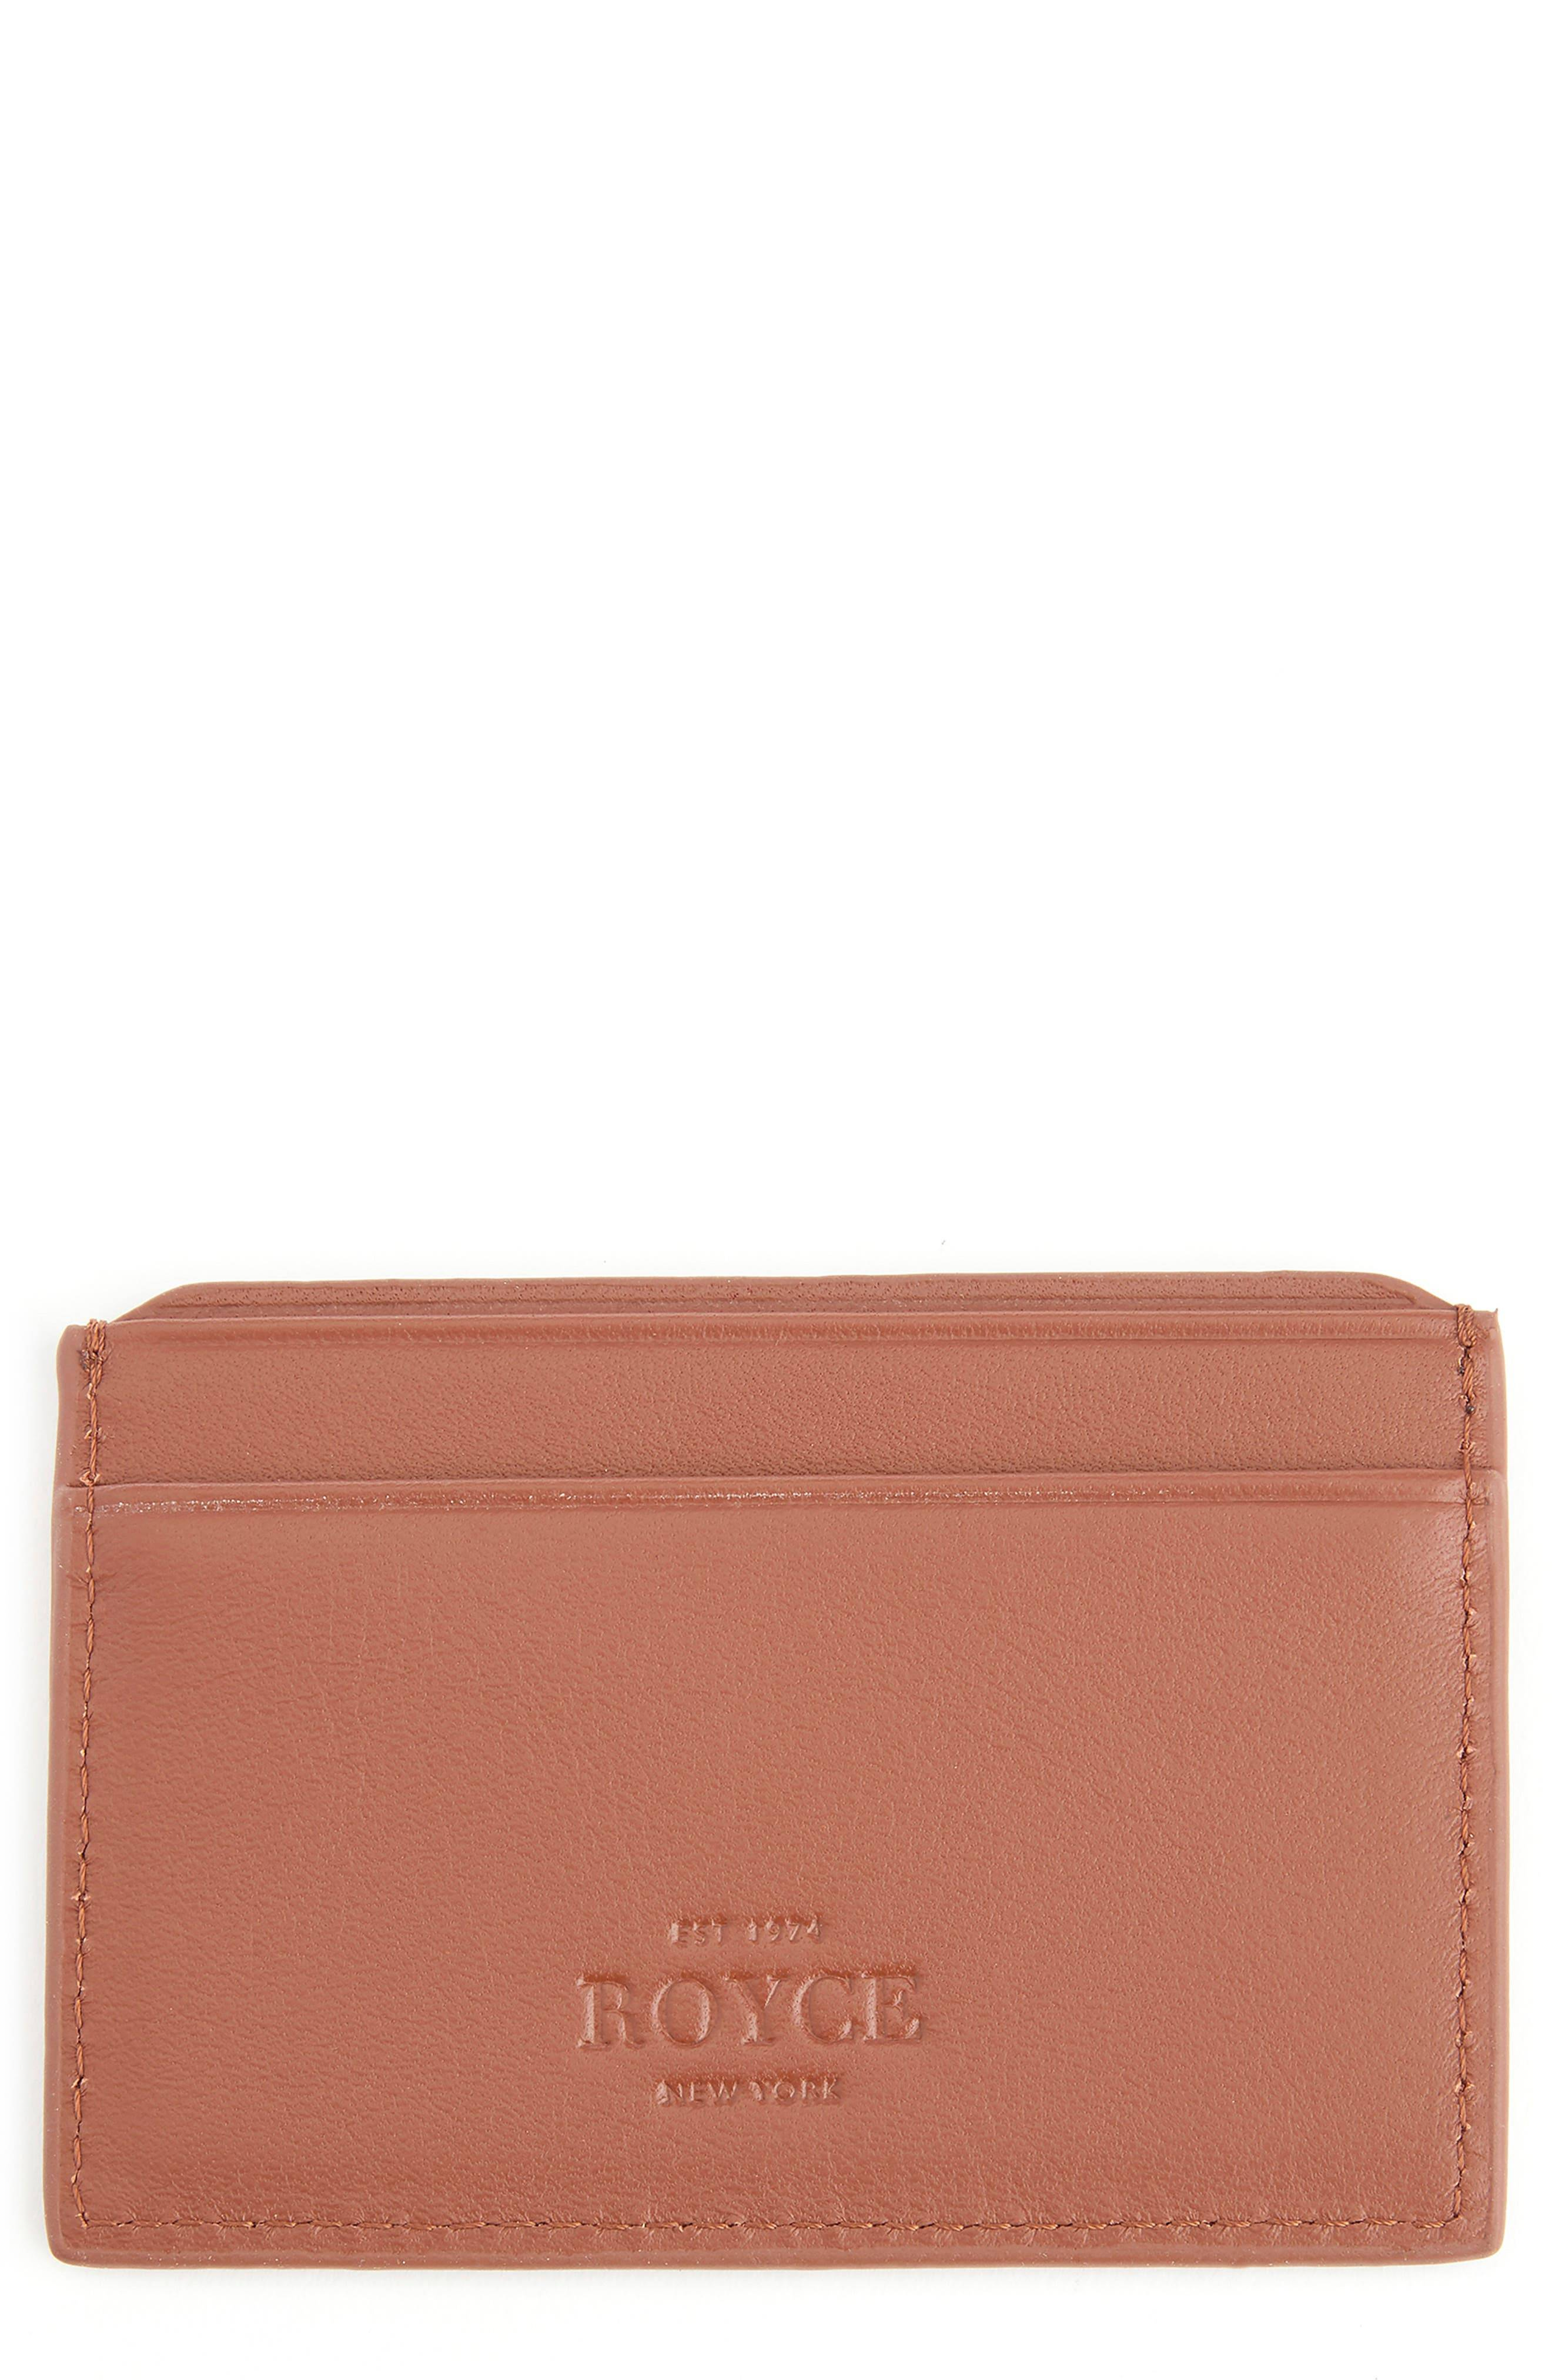 Royce Rfid Leather Card Case - Brown